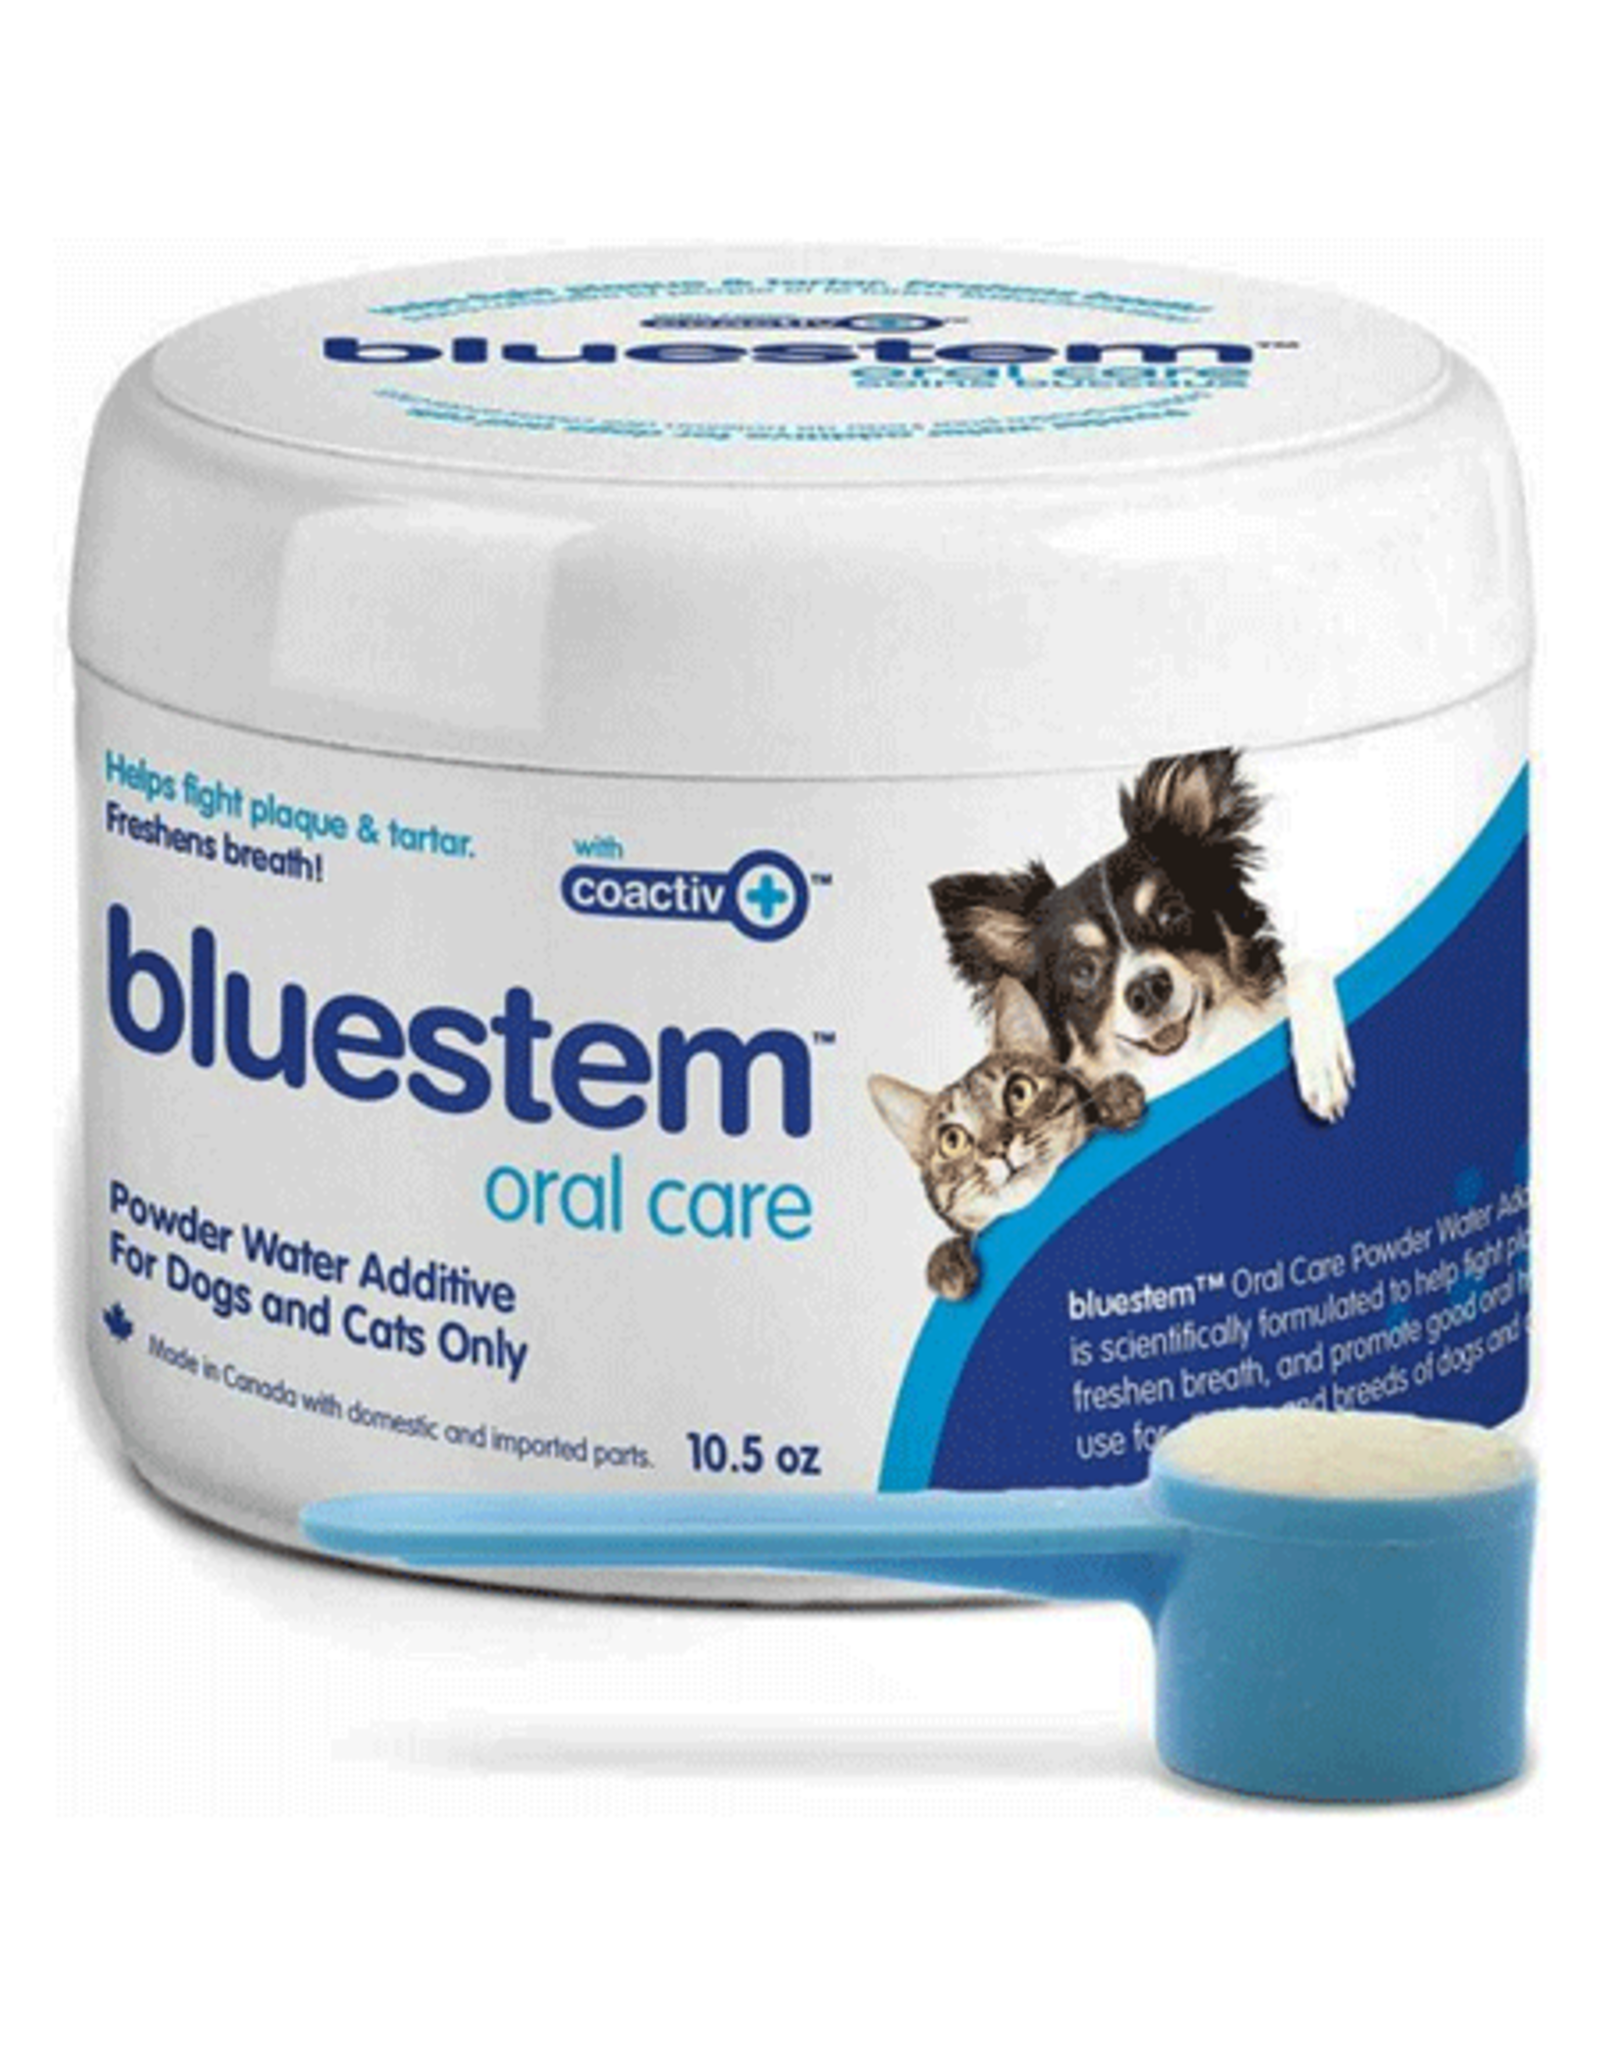 Bluestem Oral Care BLUESTEM Water Additive Powder 10.5oz